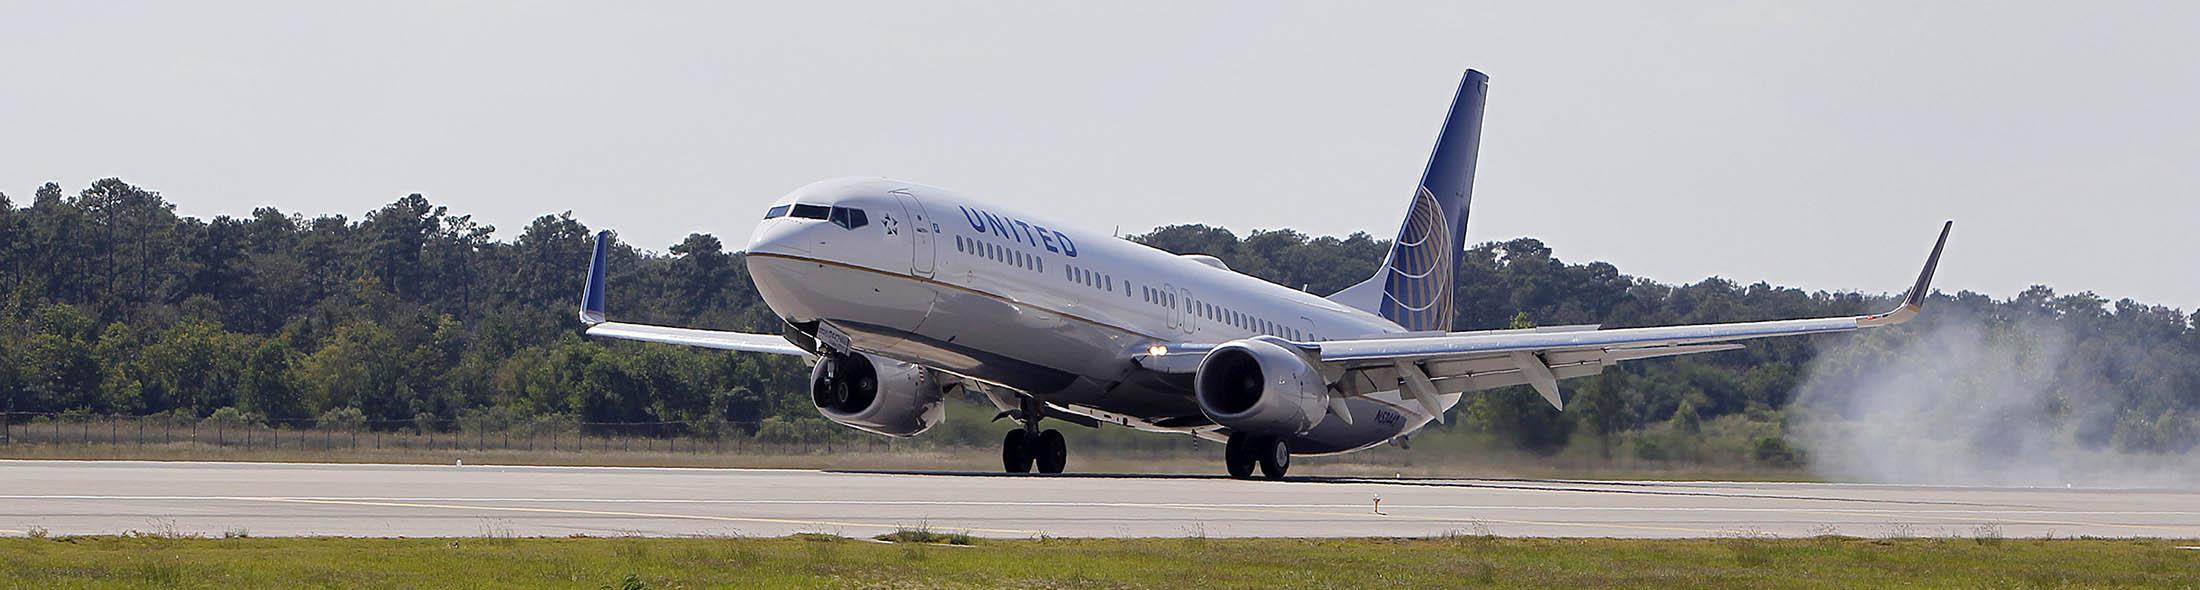 United's New Flights Stoke Fears of a Seat Glut Across Industry